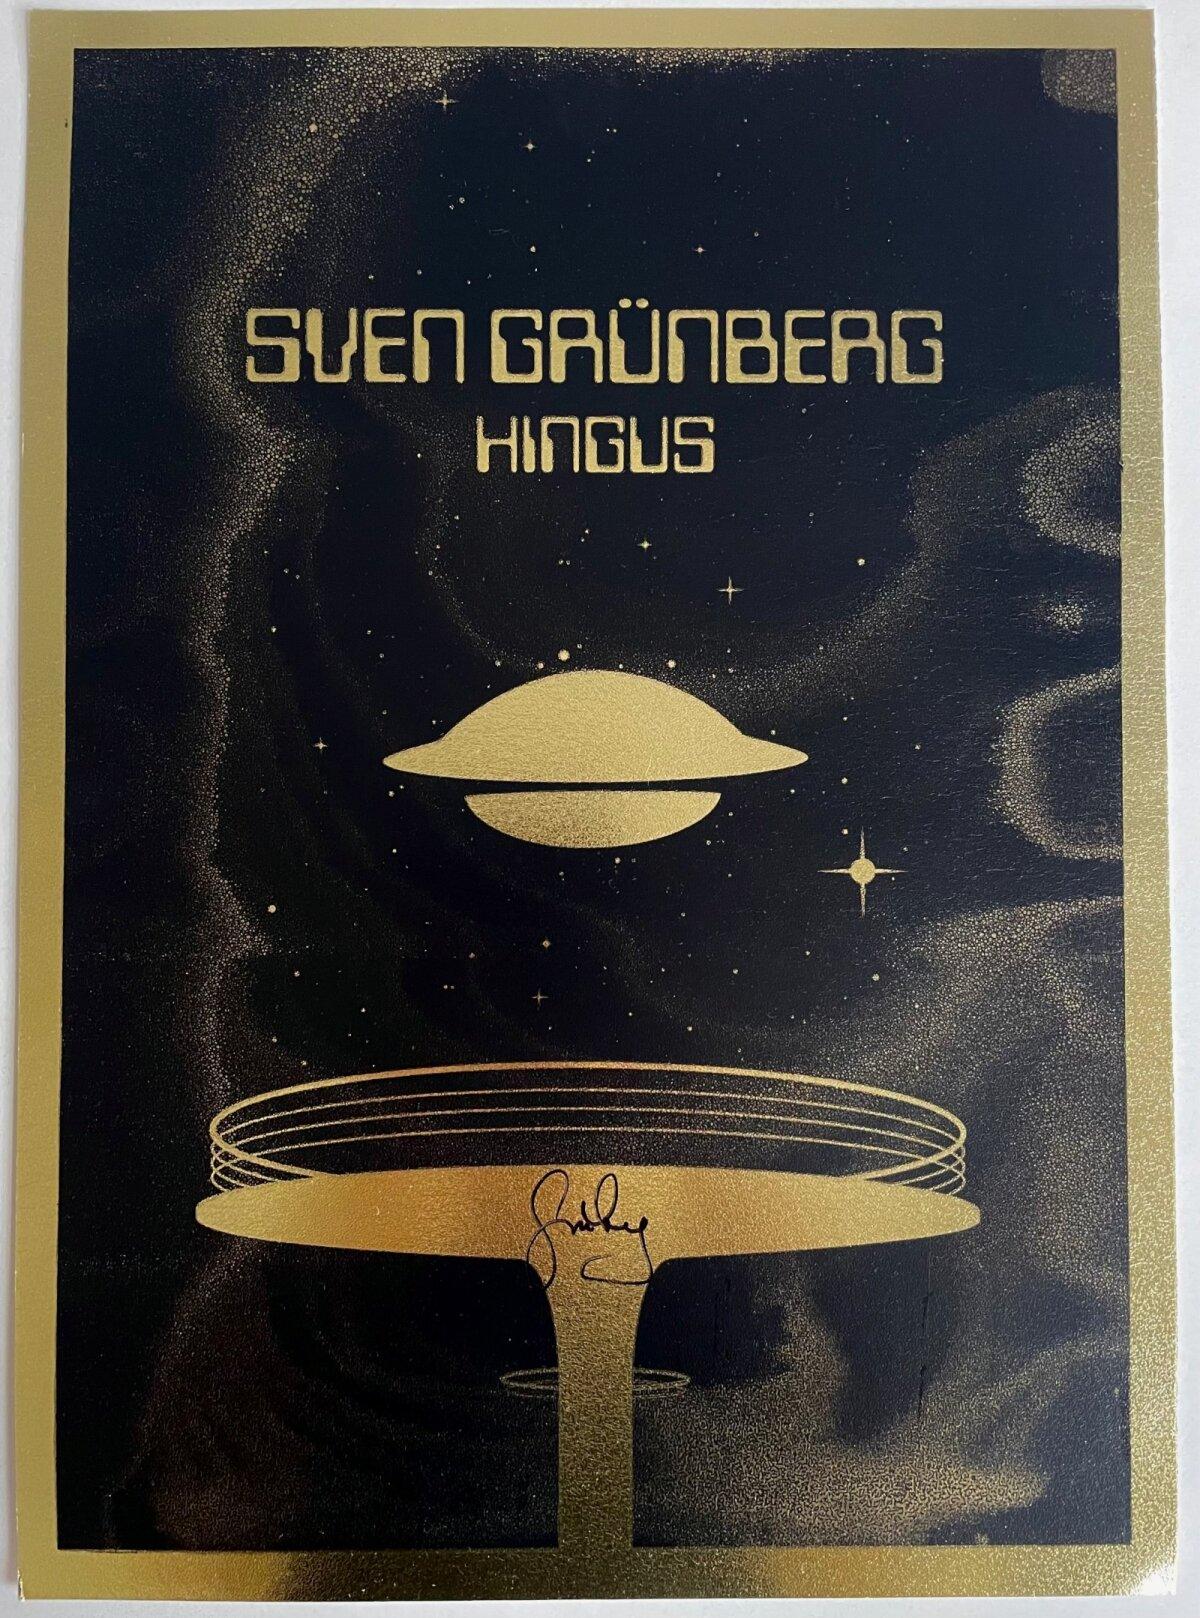 Sven Grünbergi autogrammiga plakat.